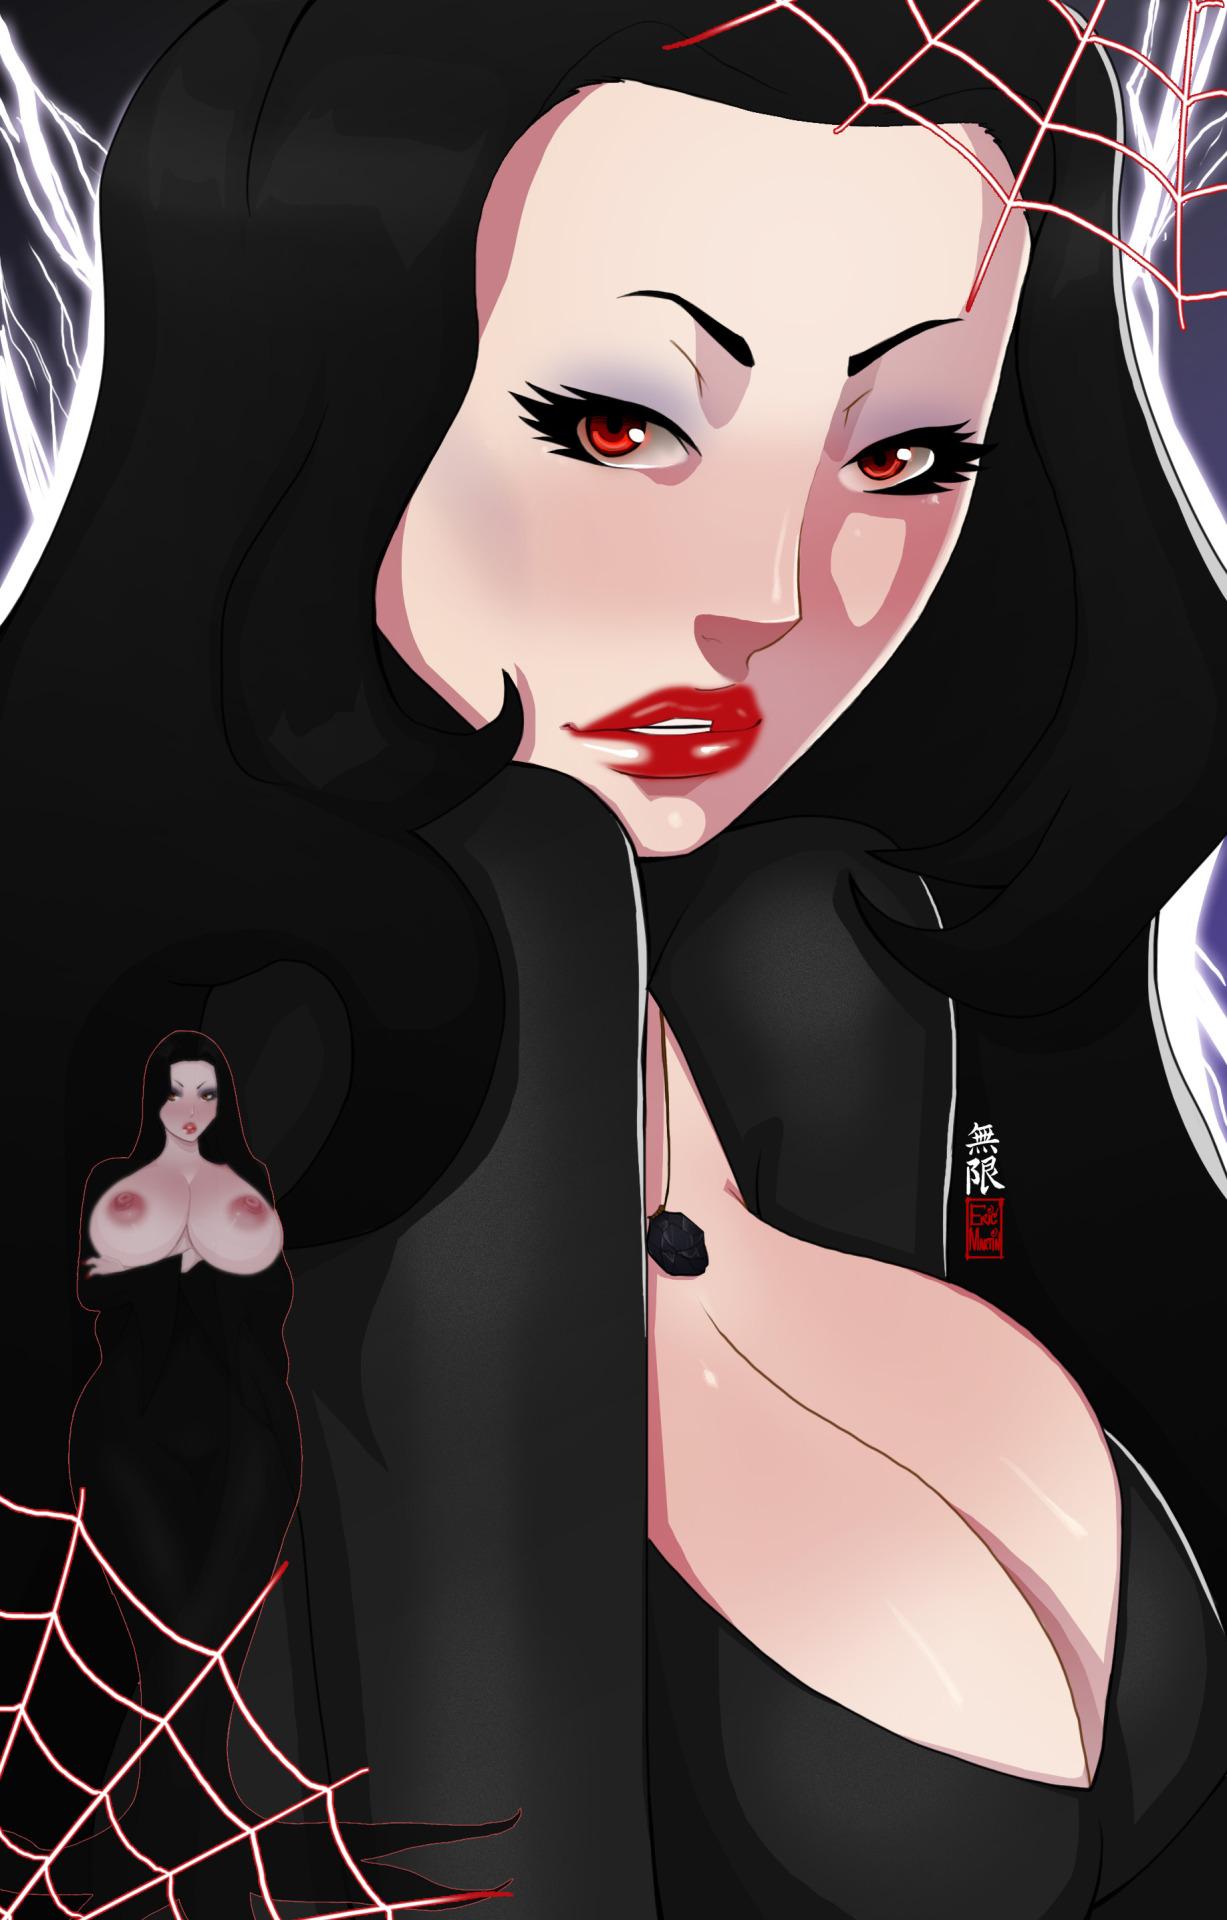 Addams Family Porn rule 34 addams family - xxxpicss